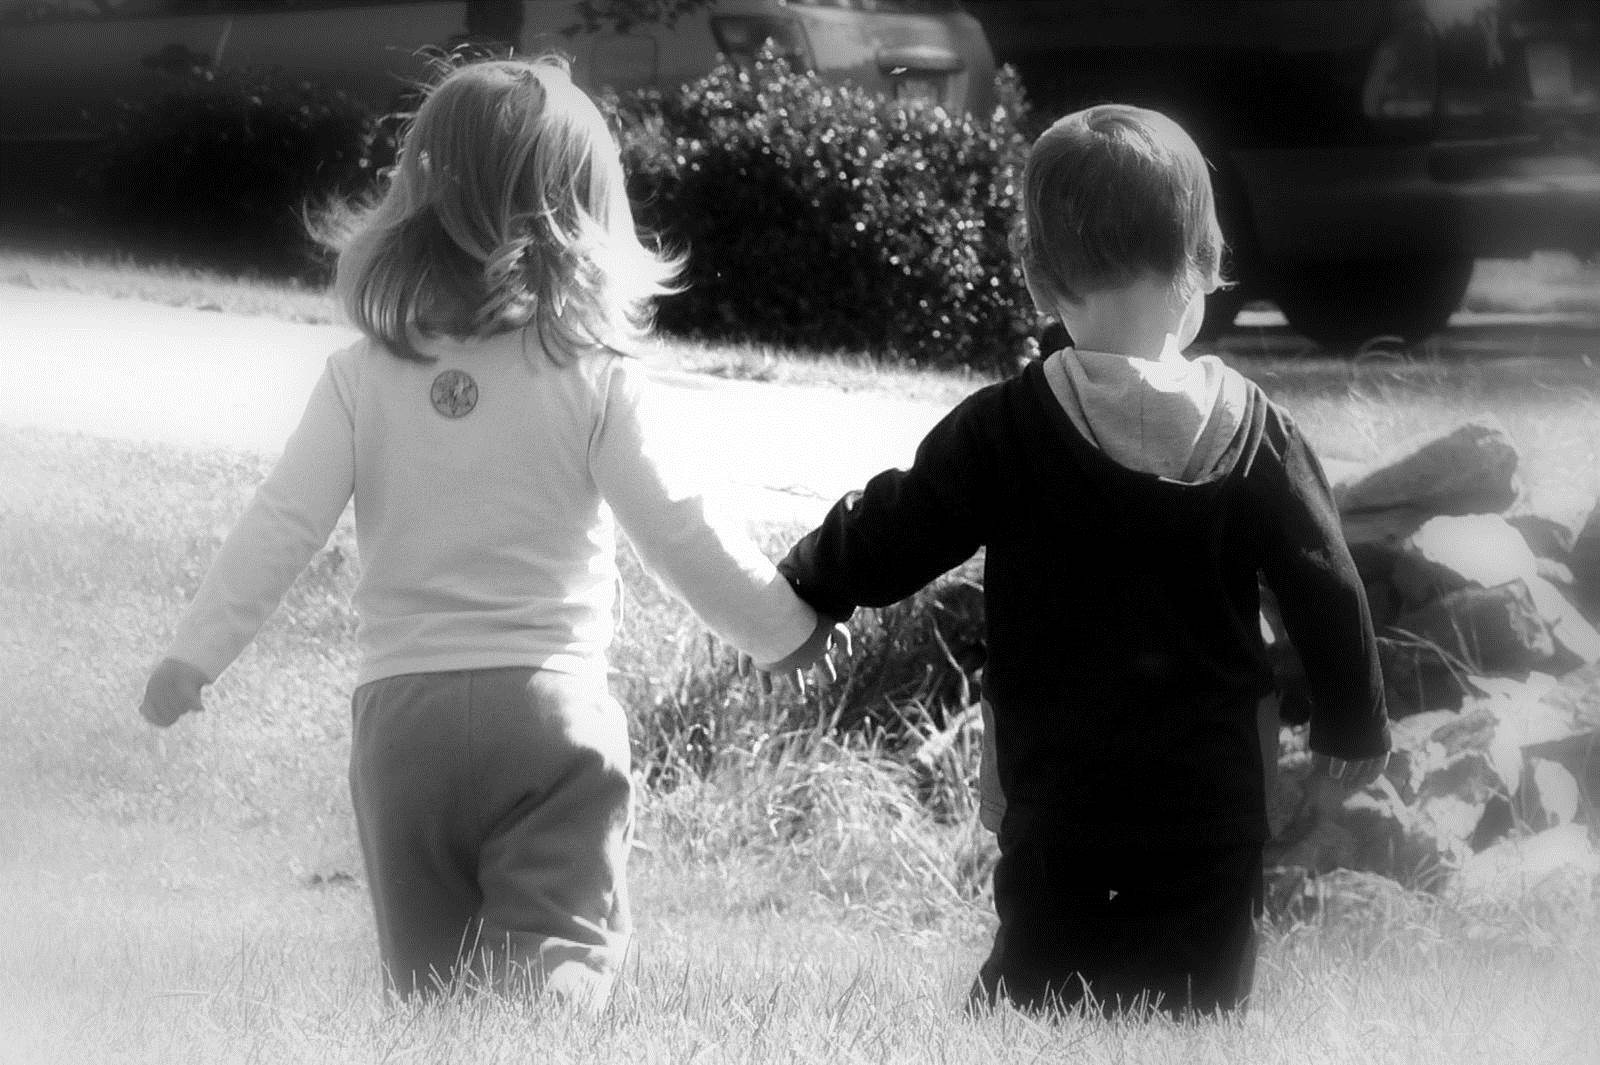 Girl Boy Love Kiss Wide Hd Wallpaper Stylish Hd Wallpapers - Cute Baby Couple Holding Hands - HD Wallpaper